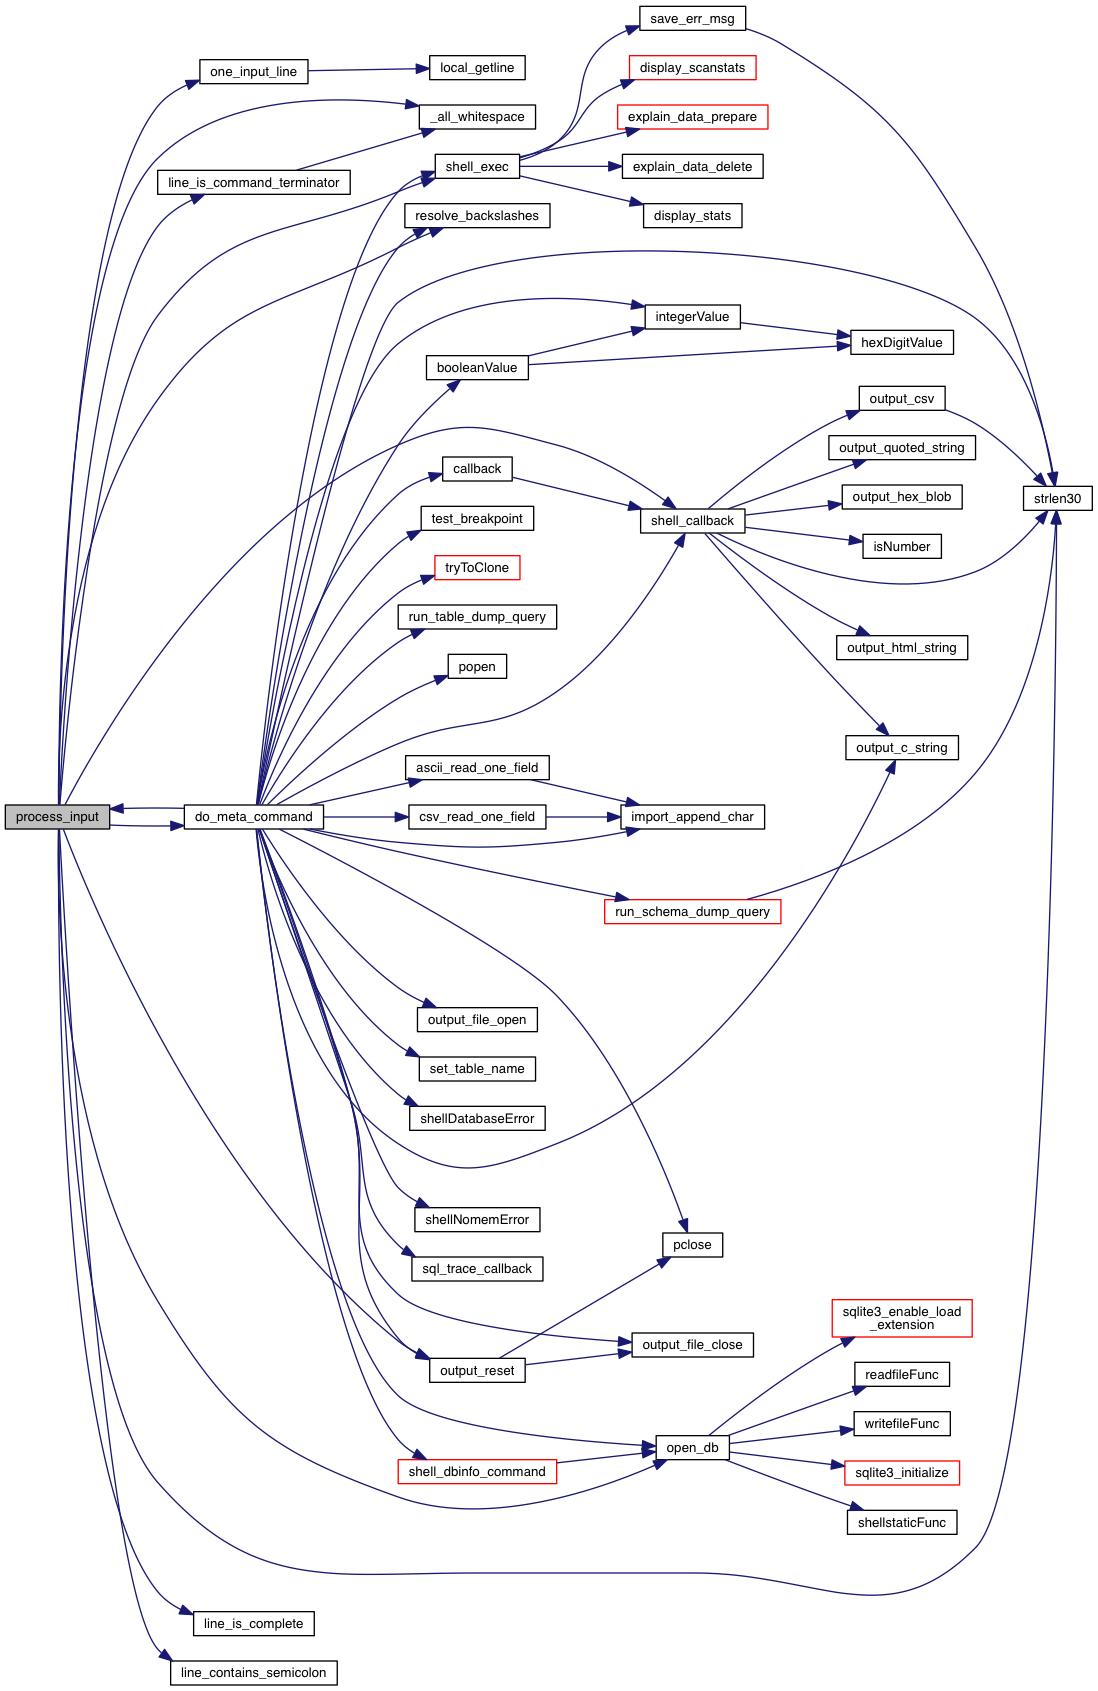 process\_input